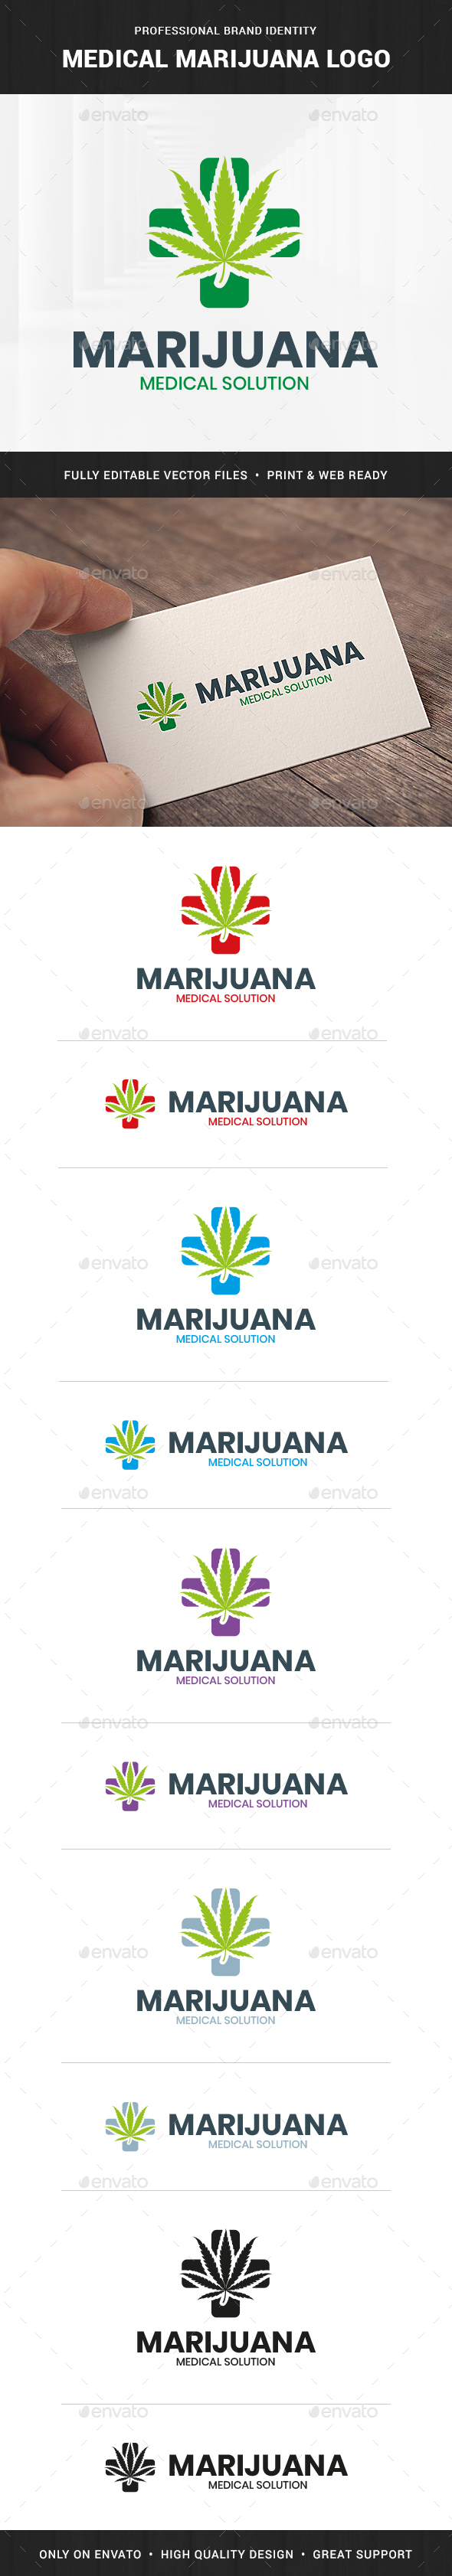 Medical Marijuana Logo Template